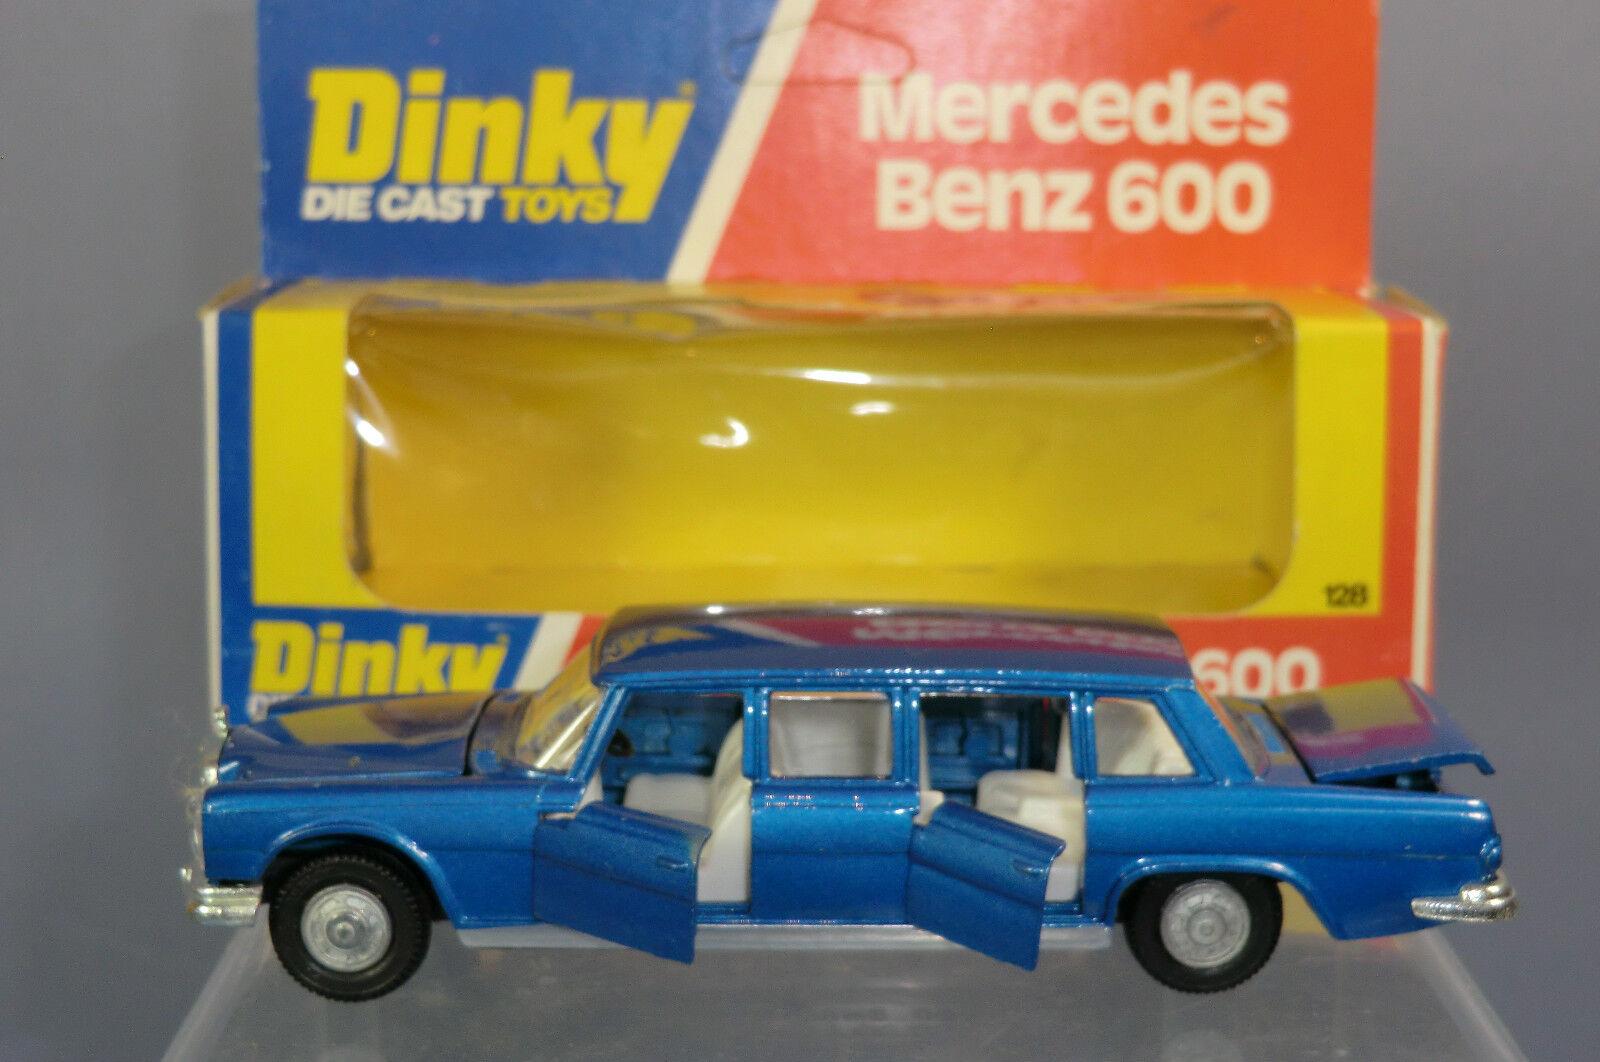 Mercedes - benz no.128 dinky spielzeug - modell 600 limousine mib